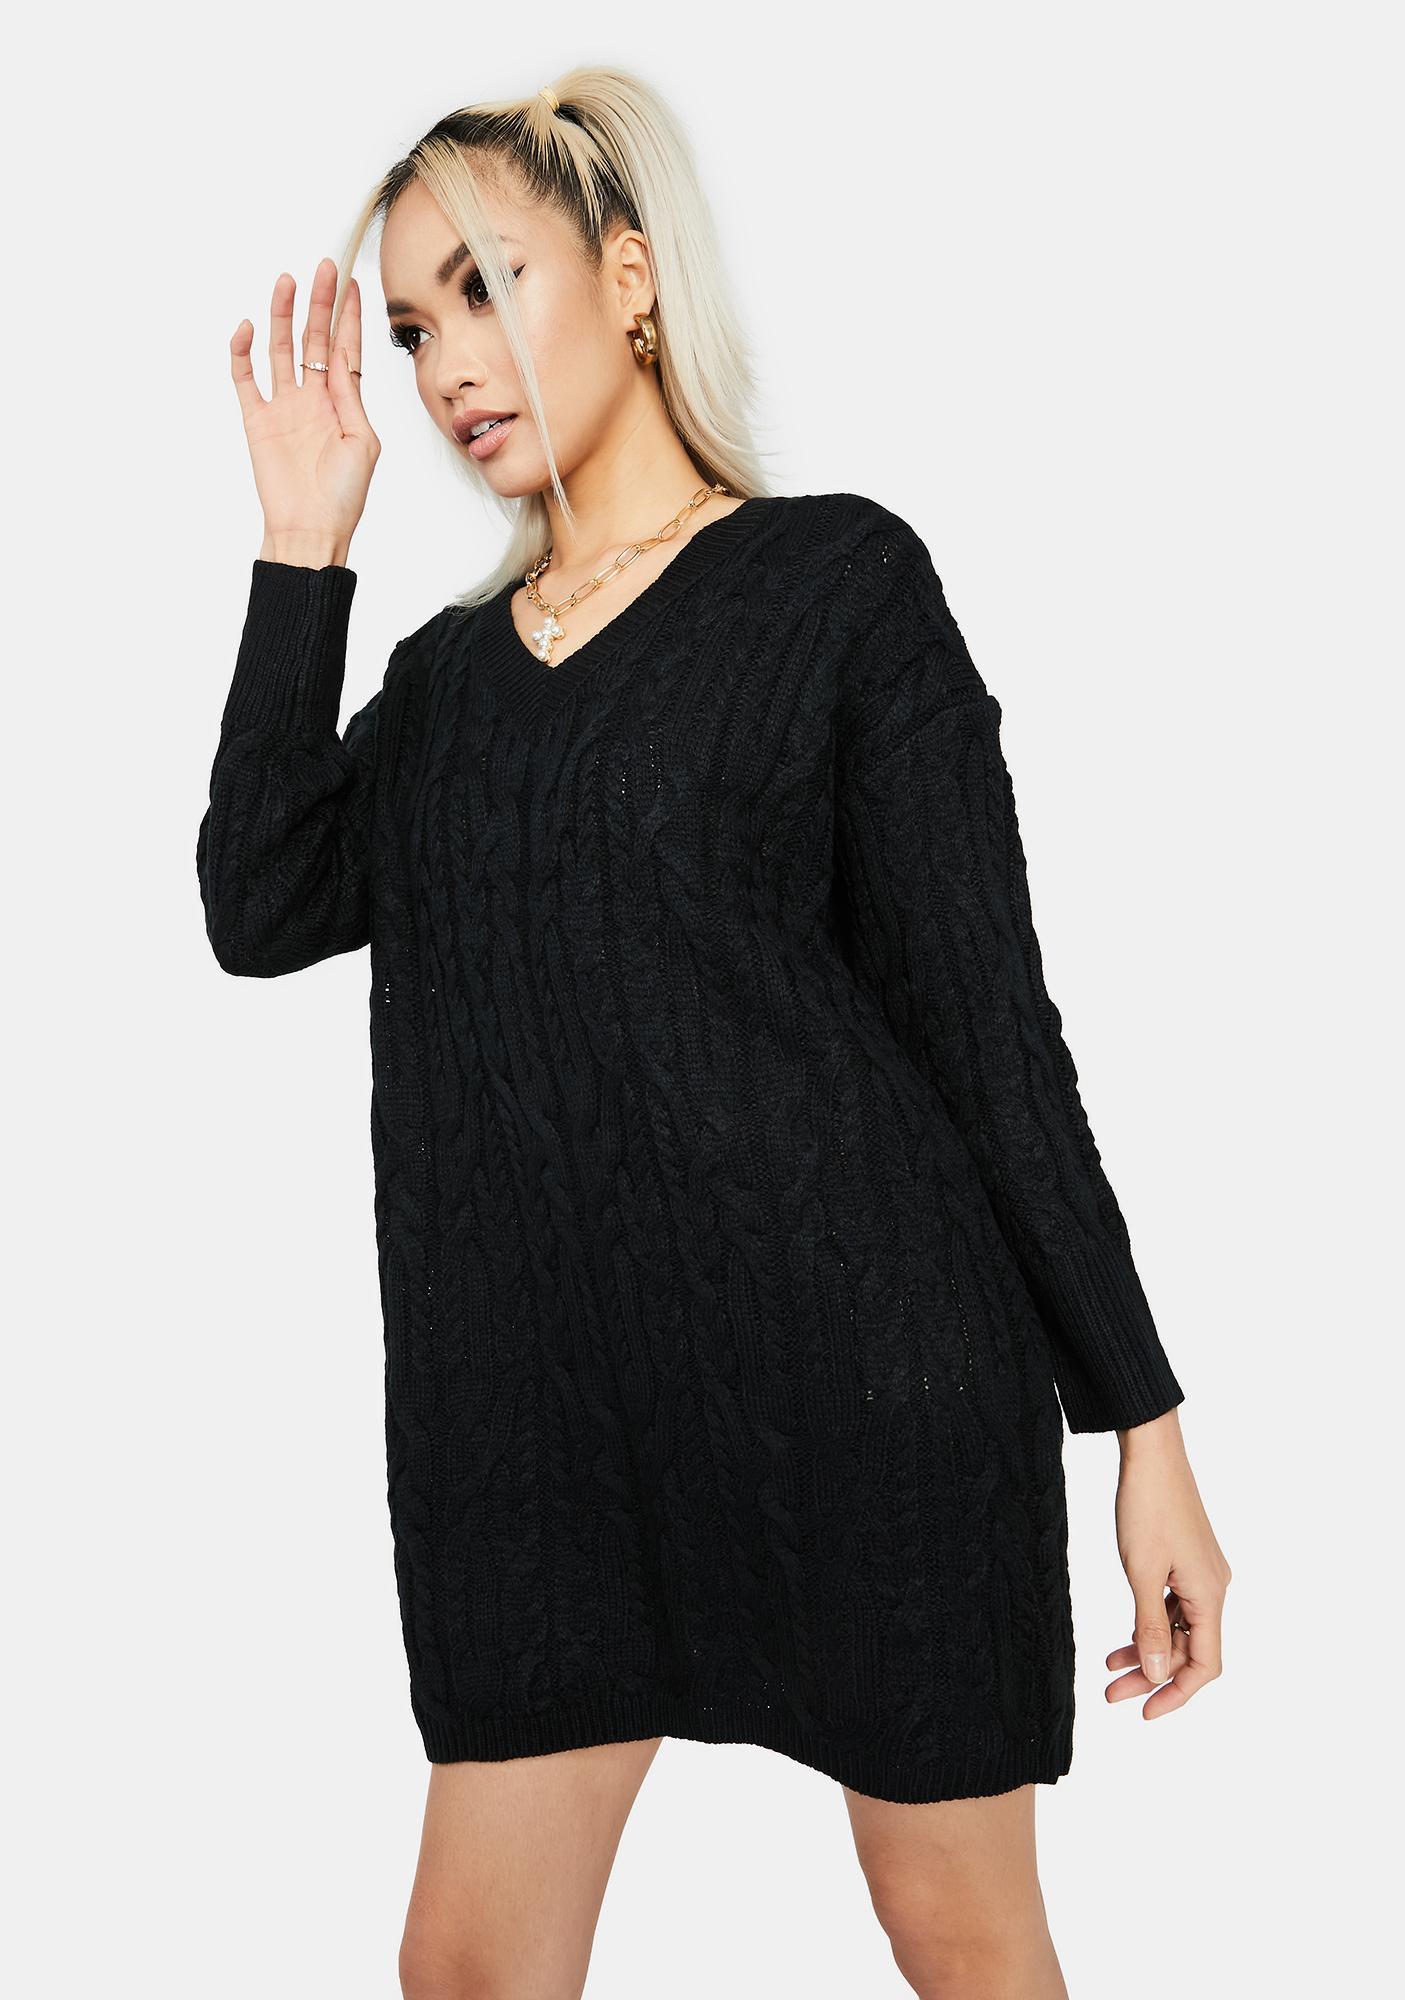 Cuddle Weather Sweater Dress